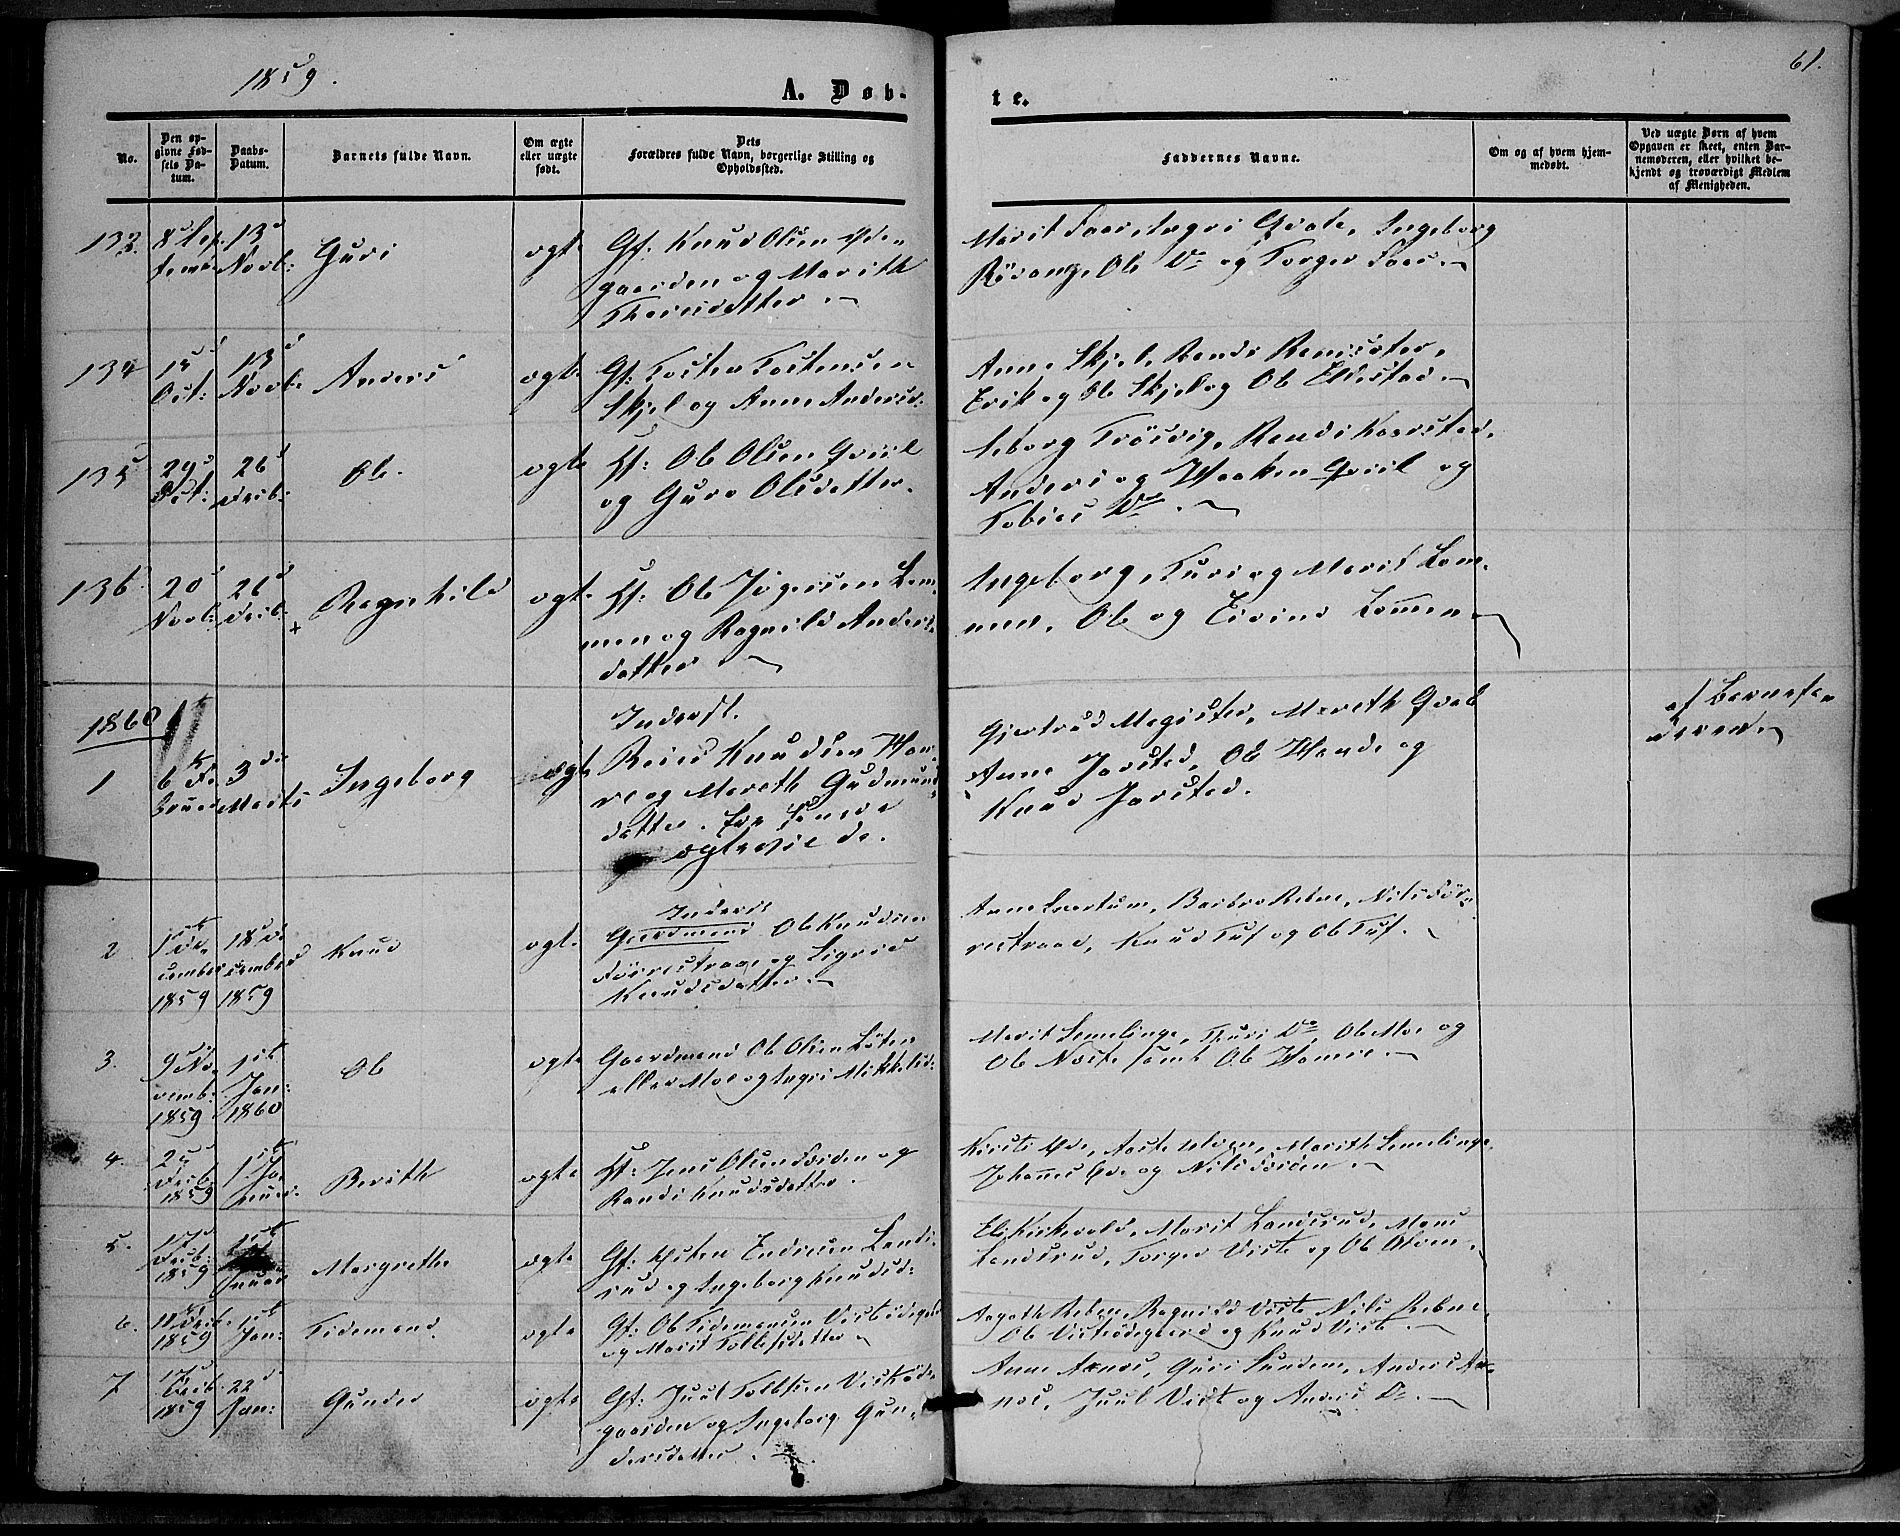 SAH, Vestre Slidre prestekontor, Ministerialbok nr. 2, 1856-1864, s. 61